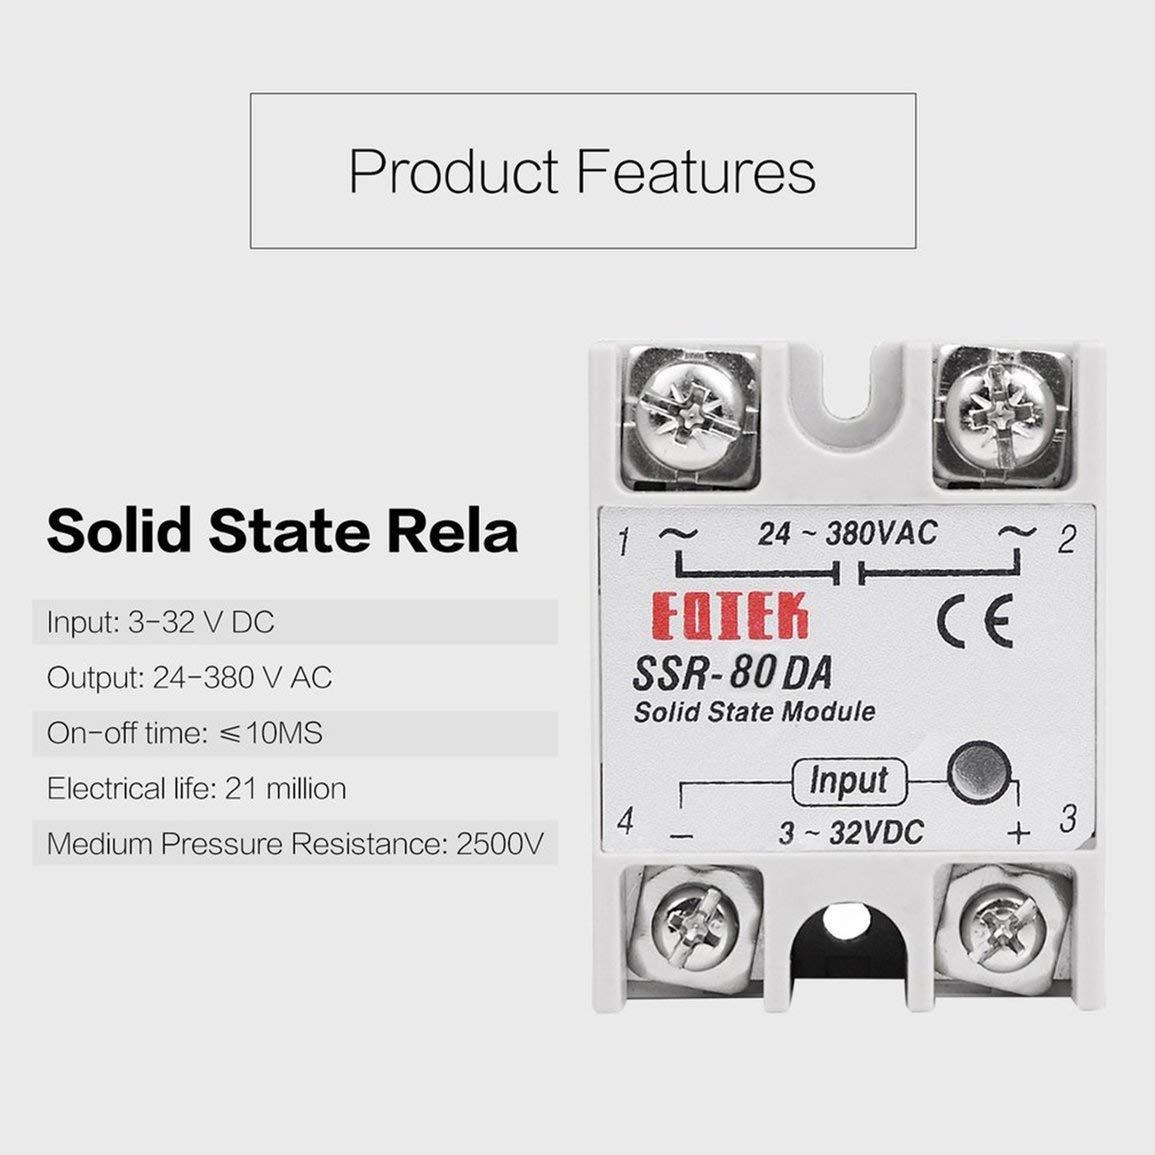 -2 Farbe: wei/ß Solid State Relais DC-AC 10A 25A 40A 60A 80A 100A 12V 3-32V DC bis 220 V AC 24-380V Last einphasig SSR f/ür die Temperaturregelung